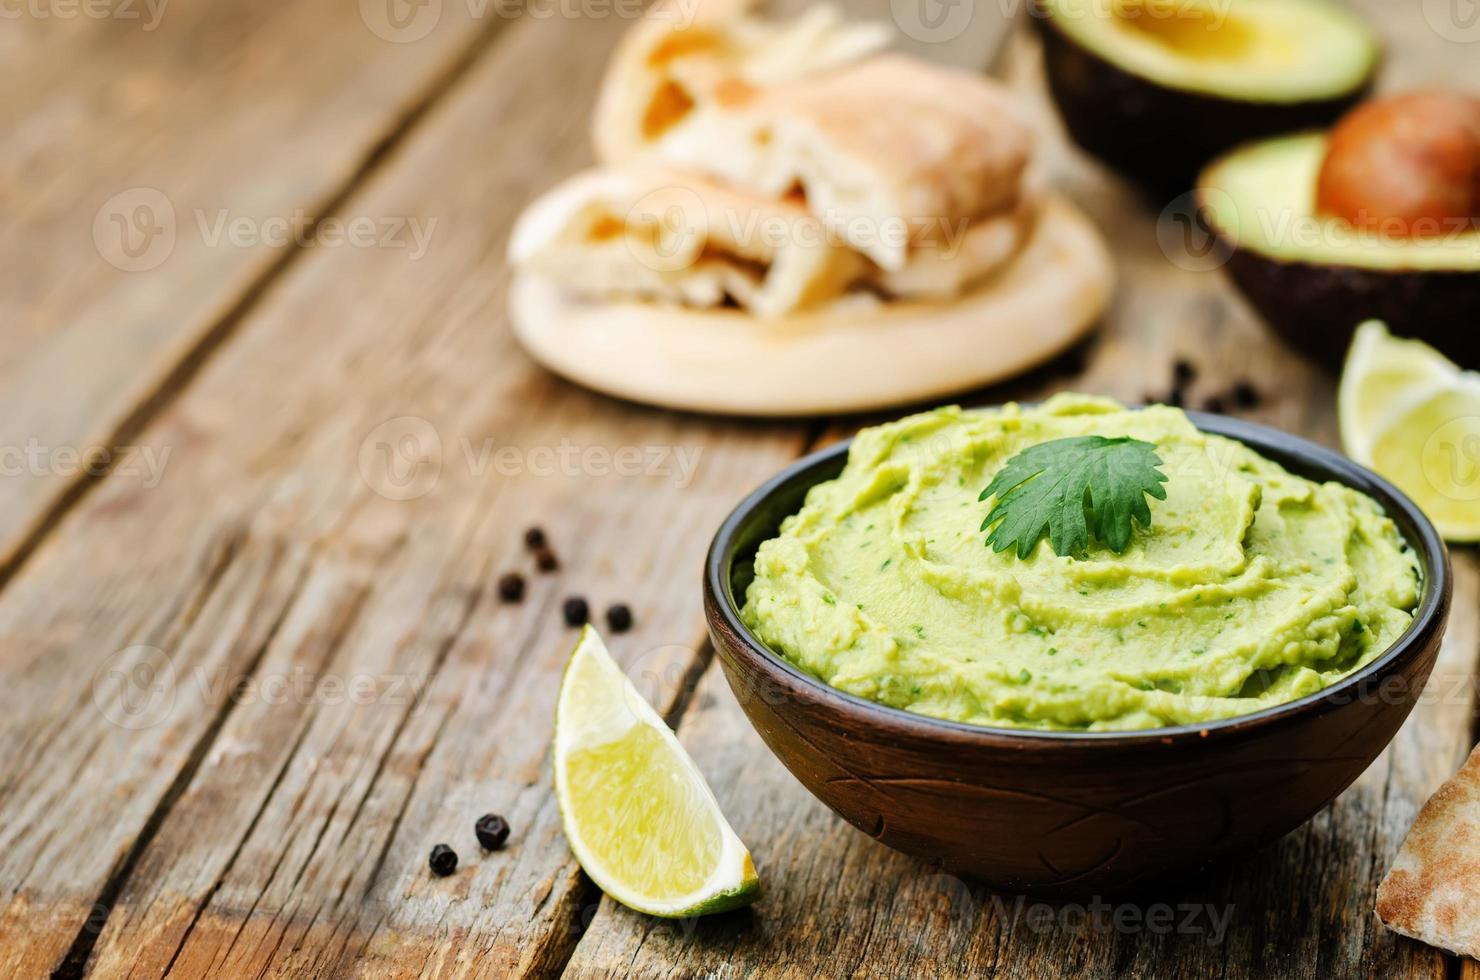 Avocado Hummus foto